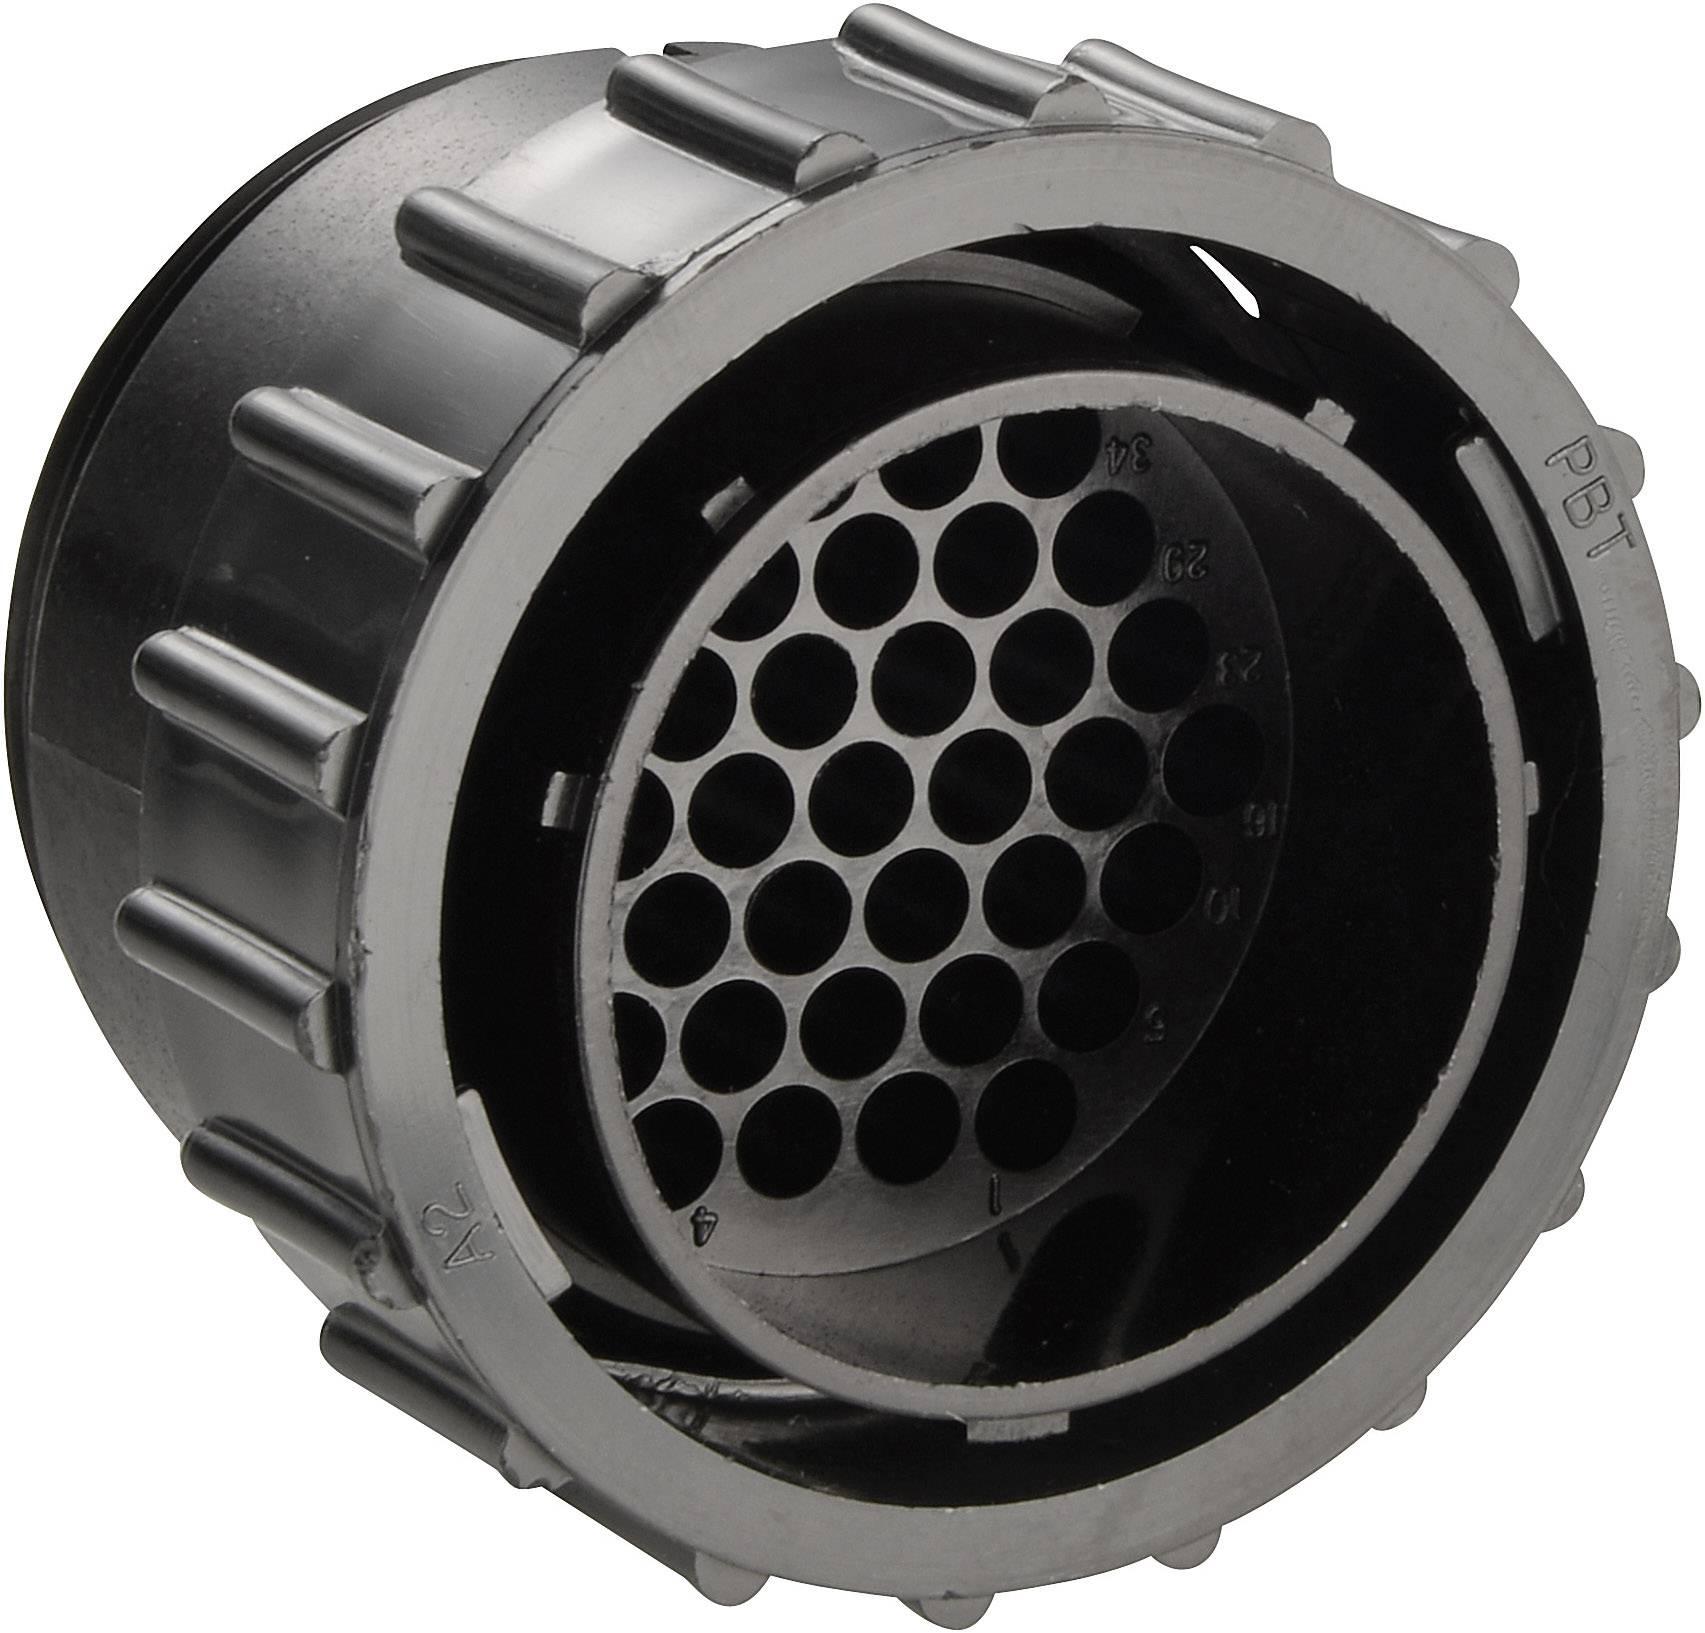 CPC, Kryt pro kontakt S MAT.III+0,75-1,5mm2,18-16 AWG